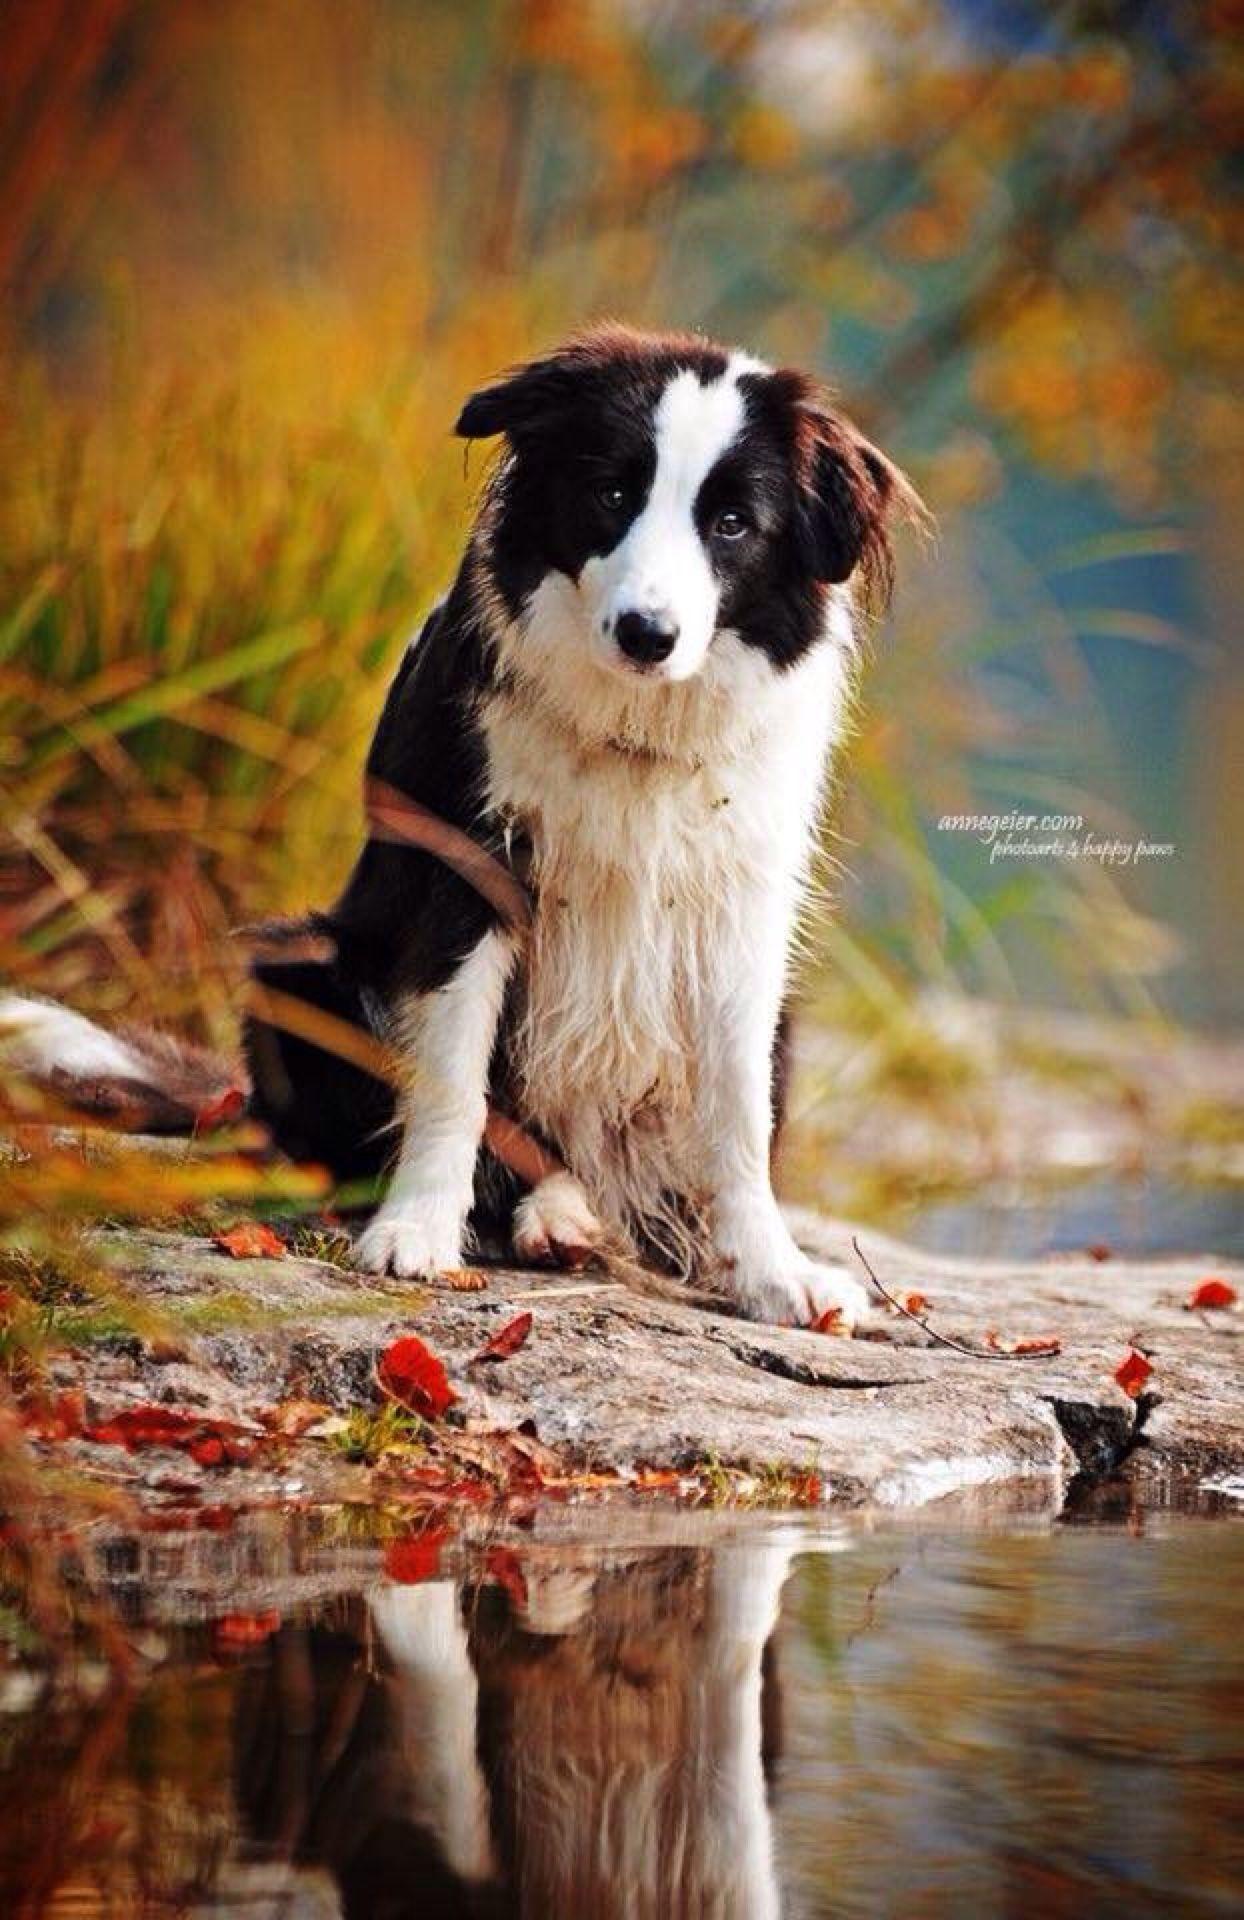 Moment S Tiere Hund Hunde Hundefotos